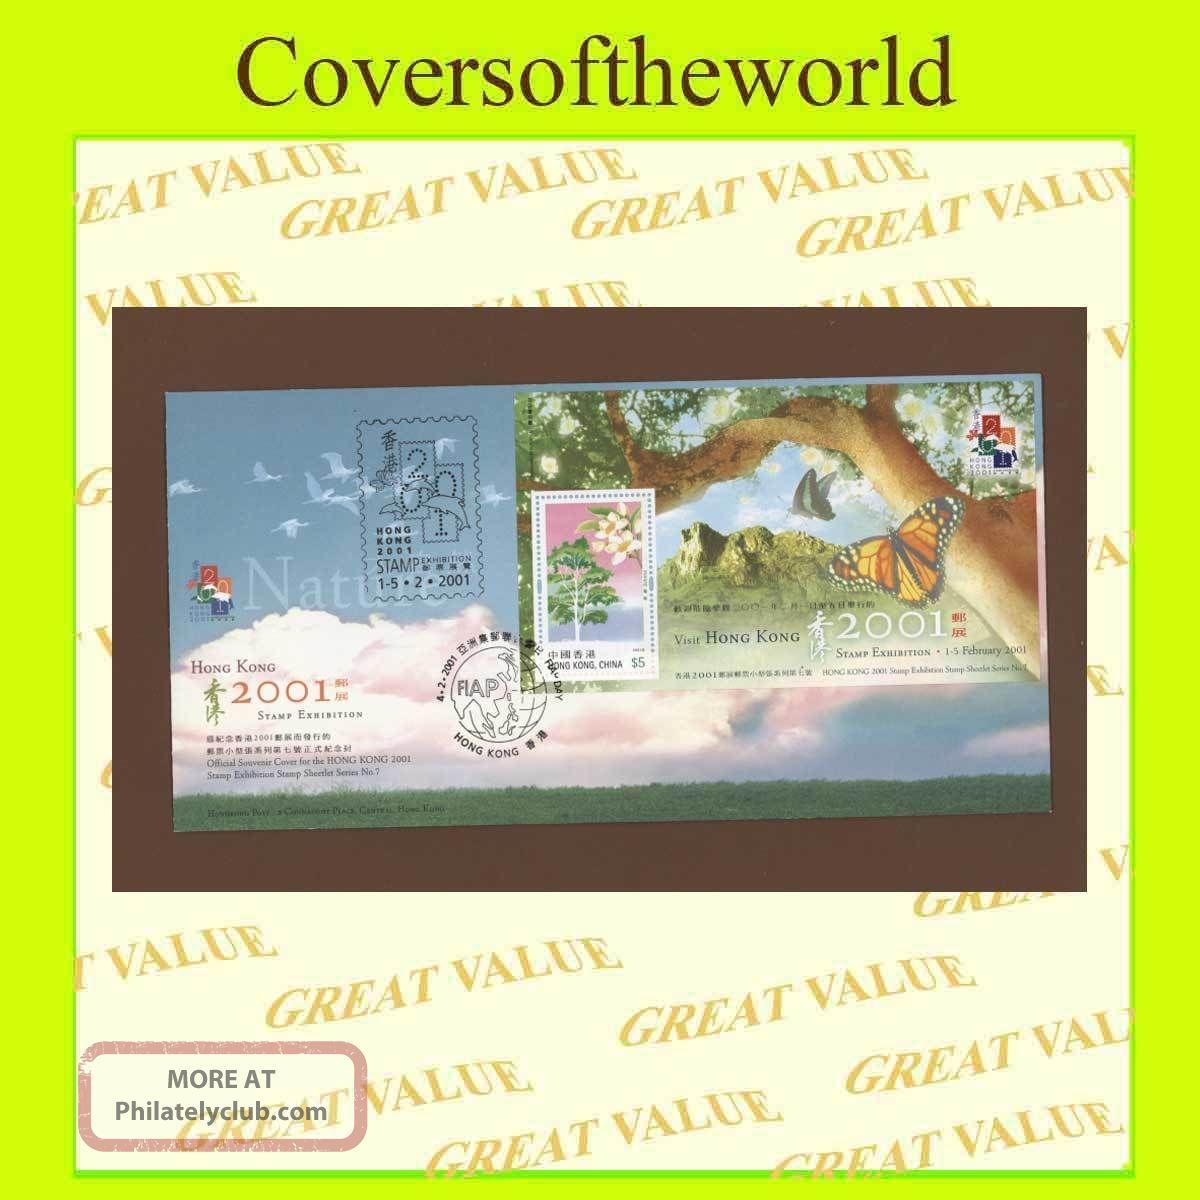 Hong Kong 2001 Stamp Exhibition Sheetlet,  Series 7,  4.  2.  01,  Fiap Cancel Asia photo